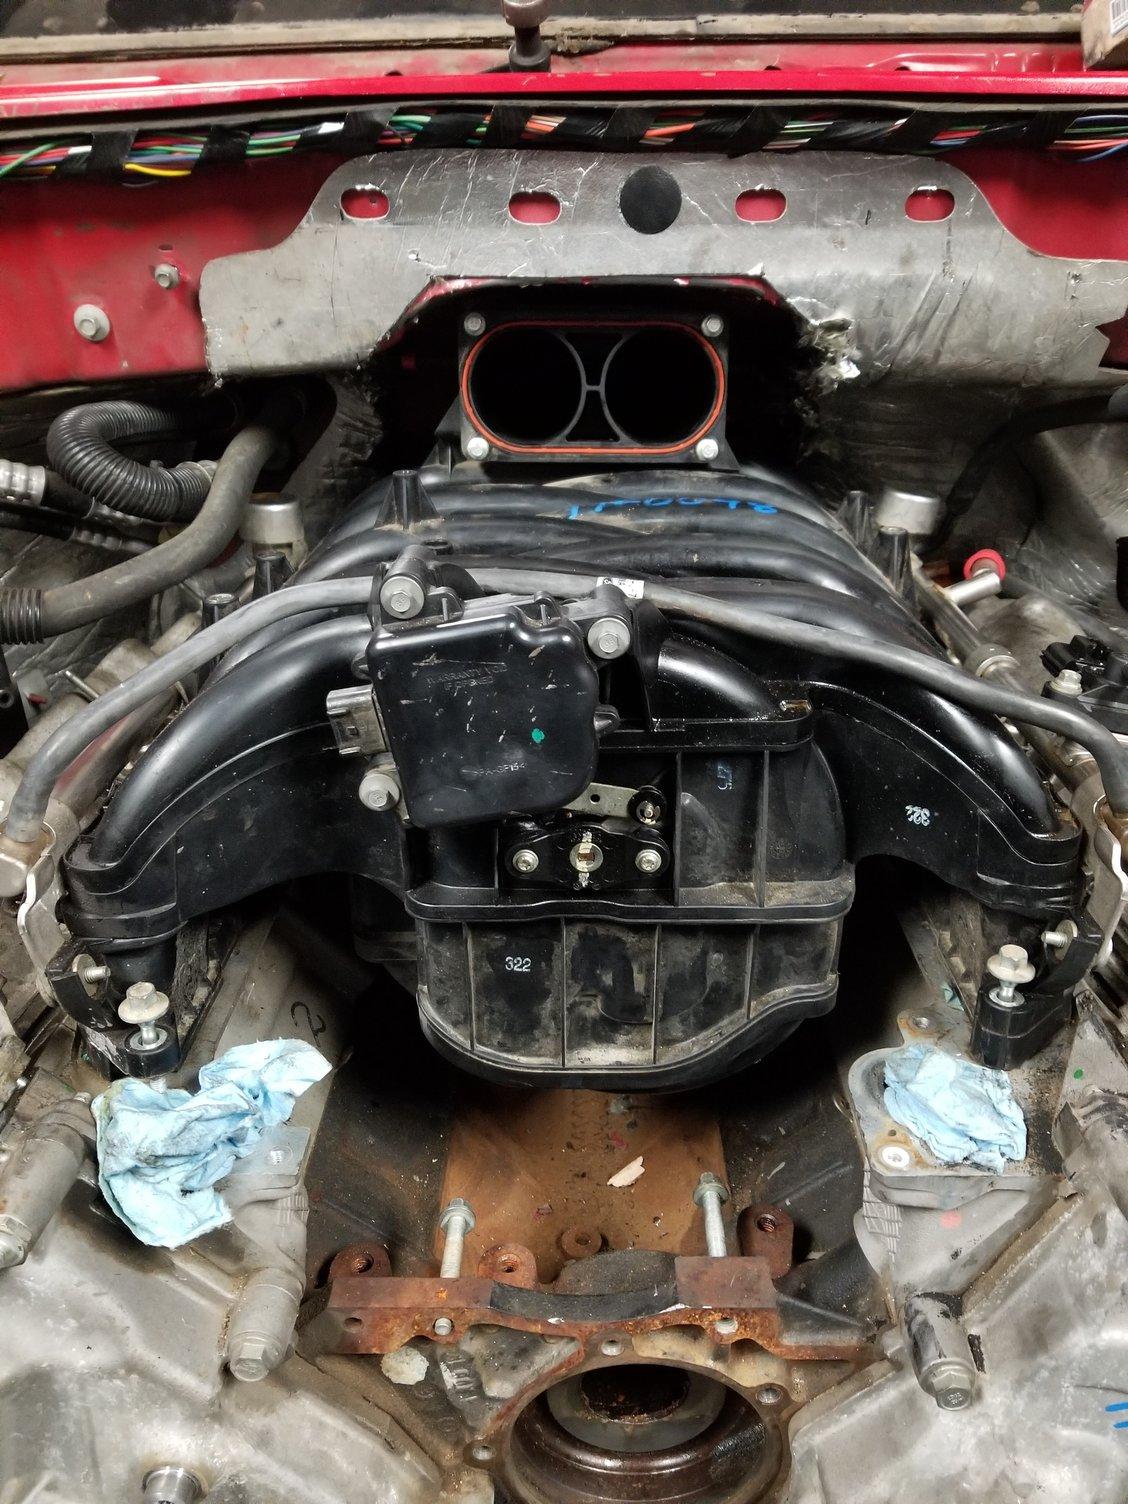 BM_4321] Ford V10 Swap Wiring Parts Wiring DiagramMarki Greas Arch Vira Mohammedshrine Librar Wiring 101